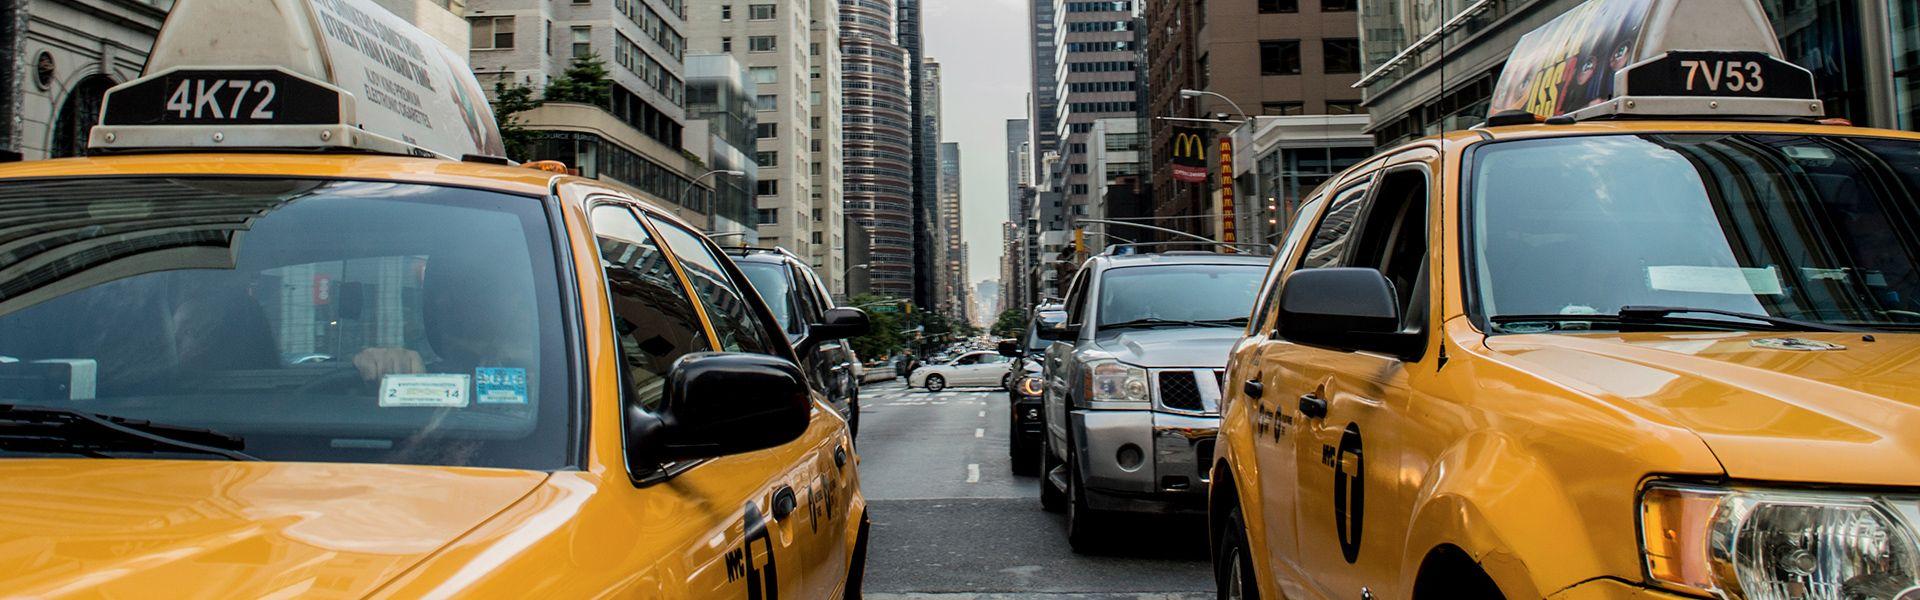 entrada-lopd-para-taxistas-001